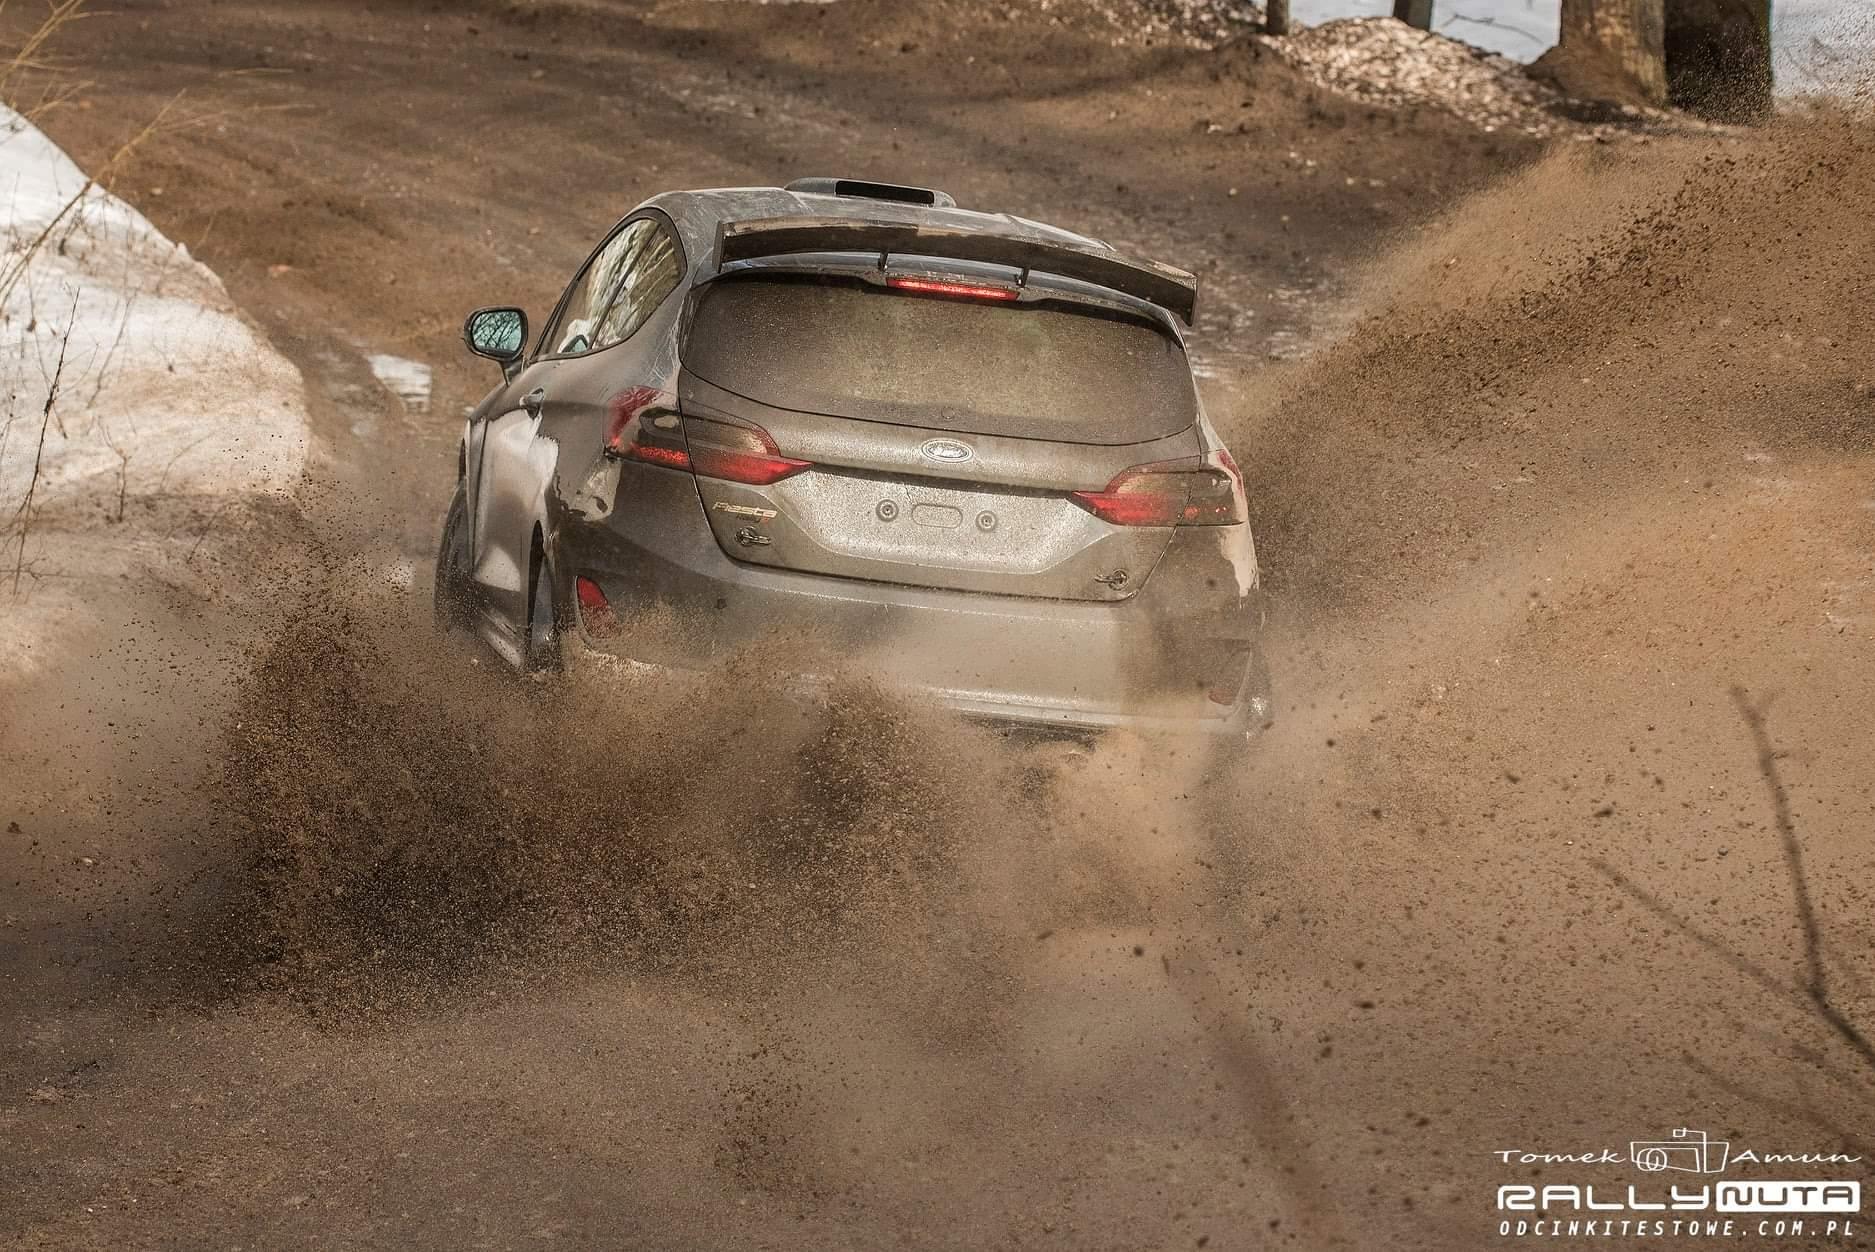 FIA European Rally Championship: Temporada 2021 - Página 3 EvBNehXXIAAdFfJ?format=jpg&name=large